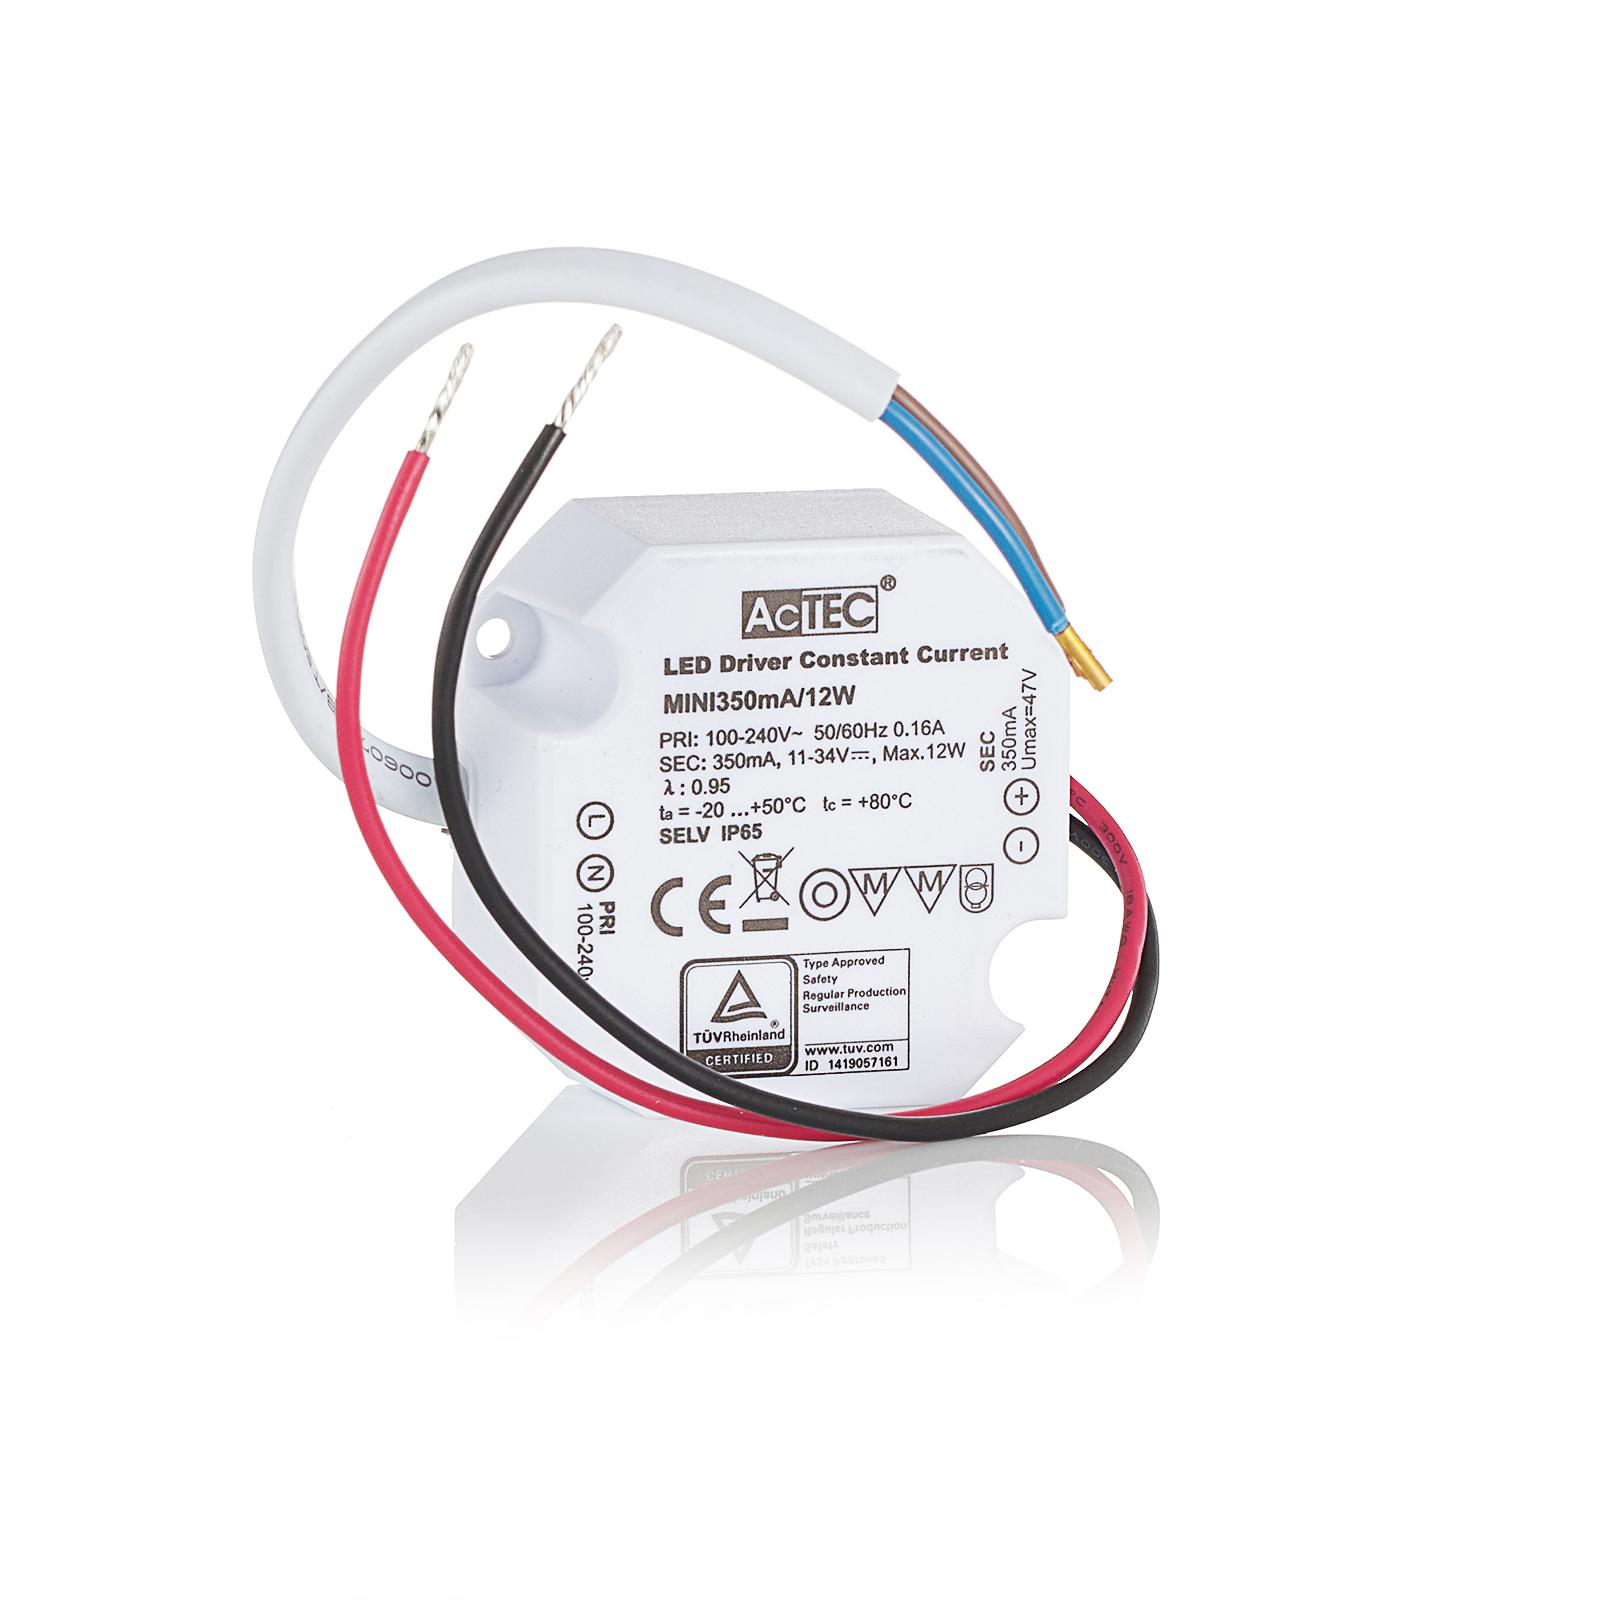 AcTEC Mini LED-driver CC 350 mA, 12 W, IP65